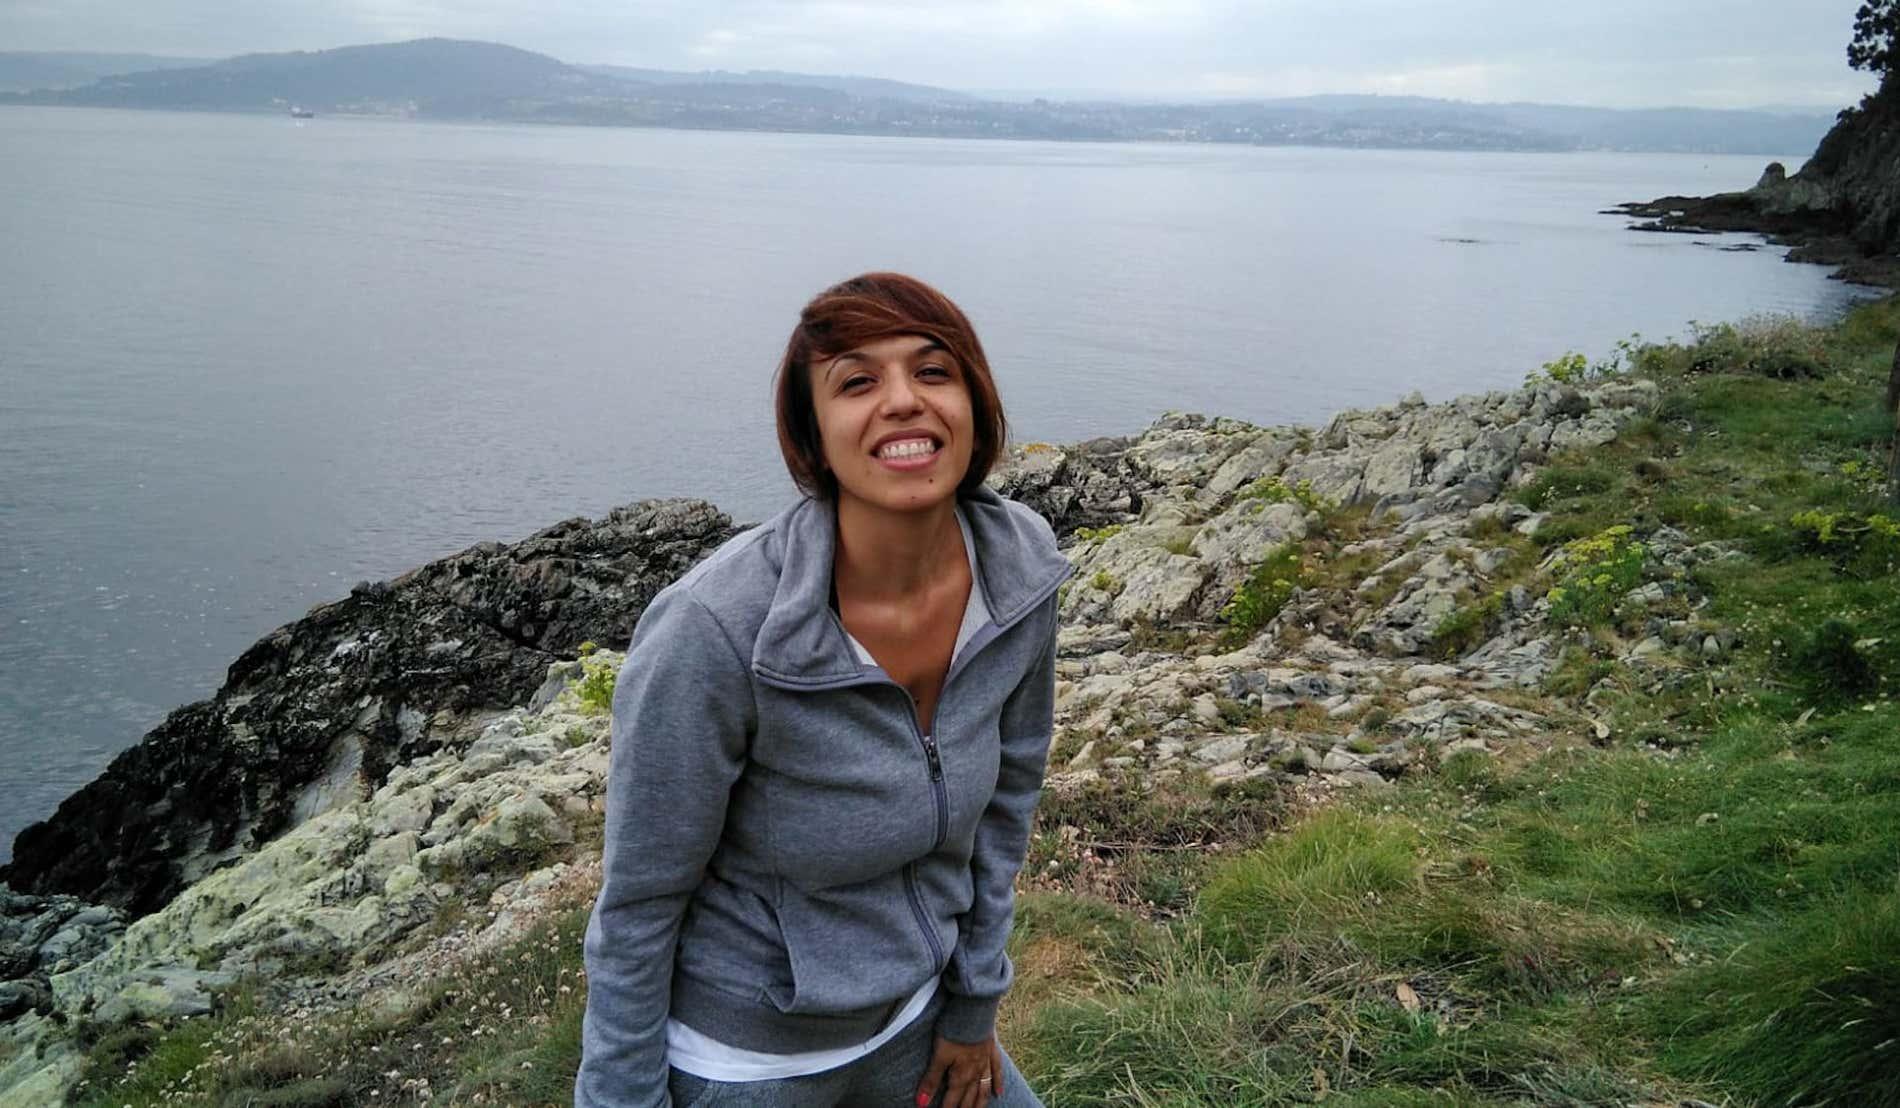 #CivitatisInsider: Giovanna Ficarazzi, Italian Market Manager